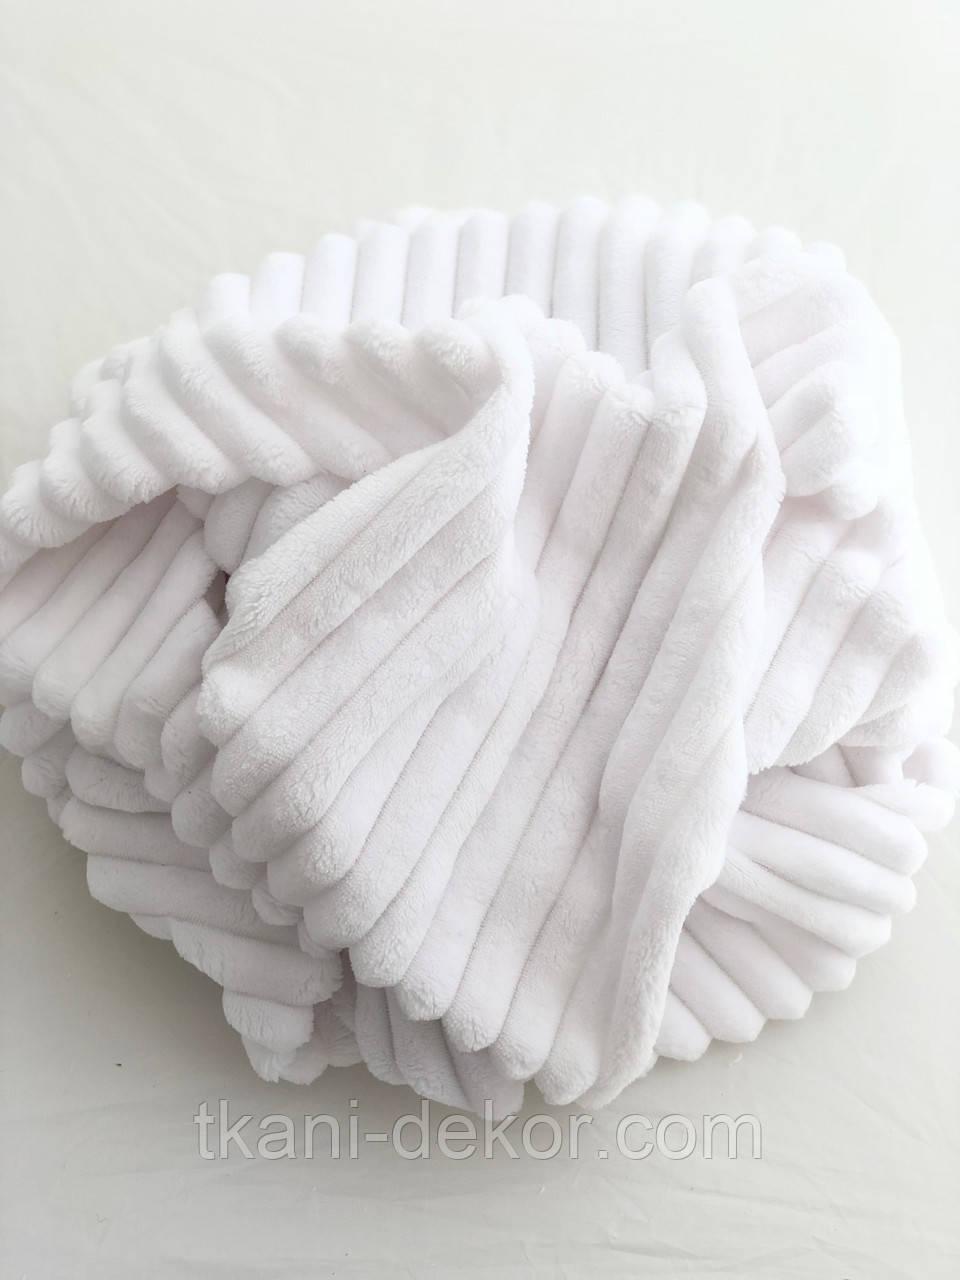 Плюшевая ткань Minky Stripes белого цвета шарпей (невыбеленный)  (лоскут 60*160)